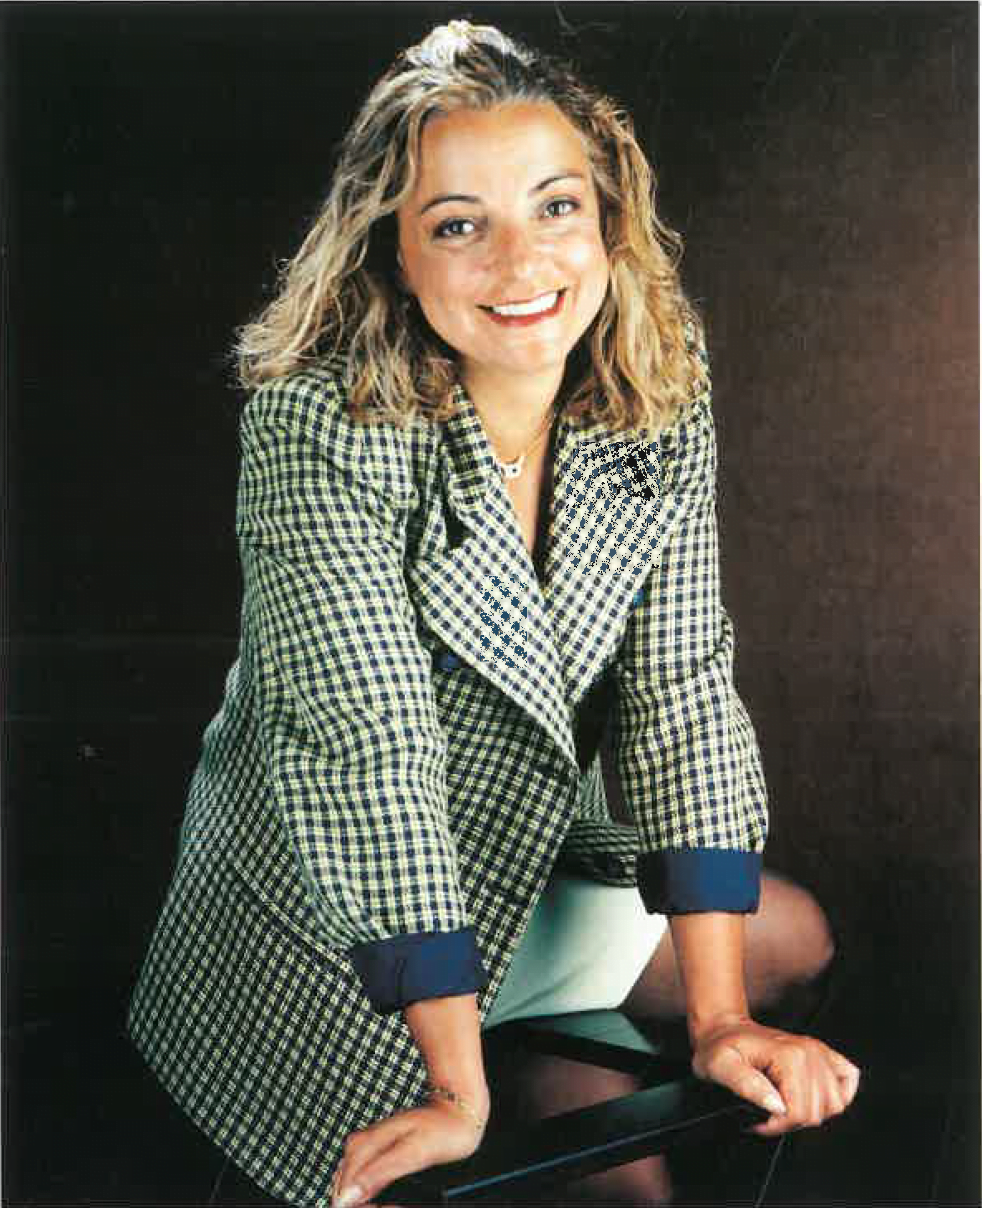 Maria Dolors Serrano